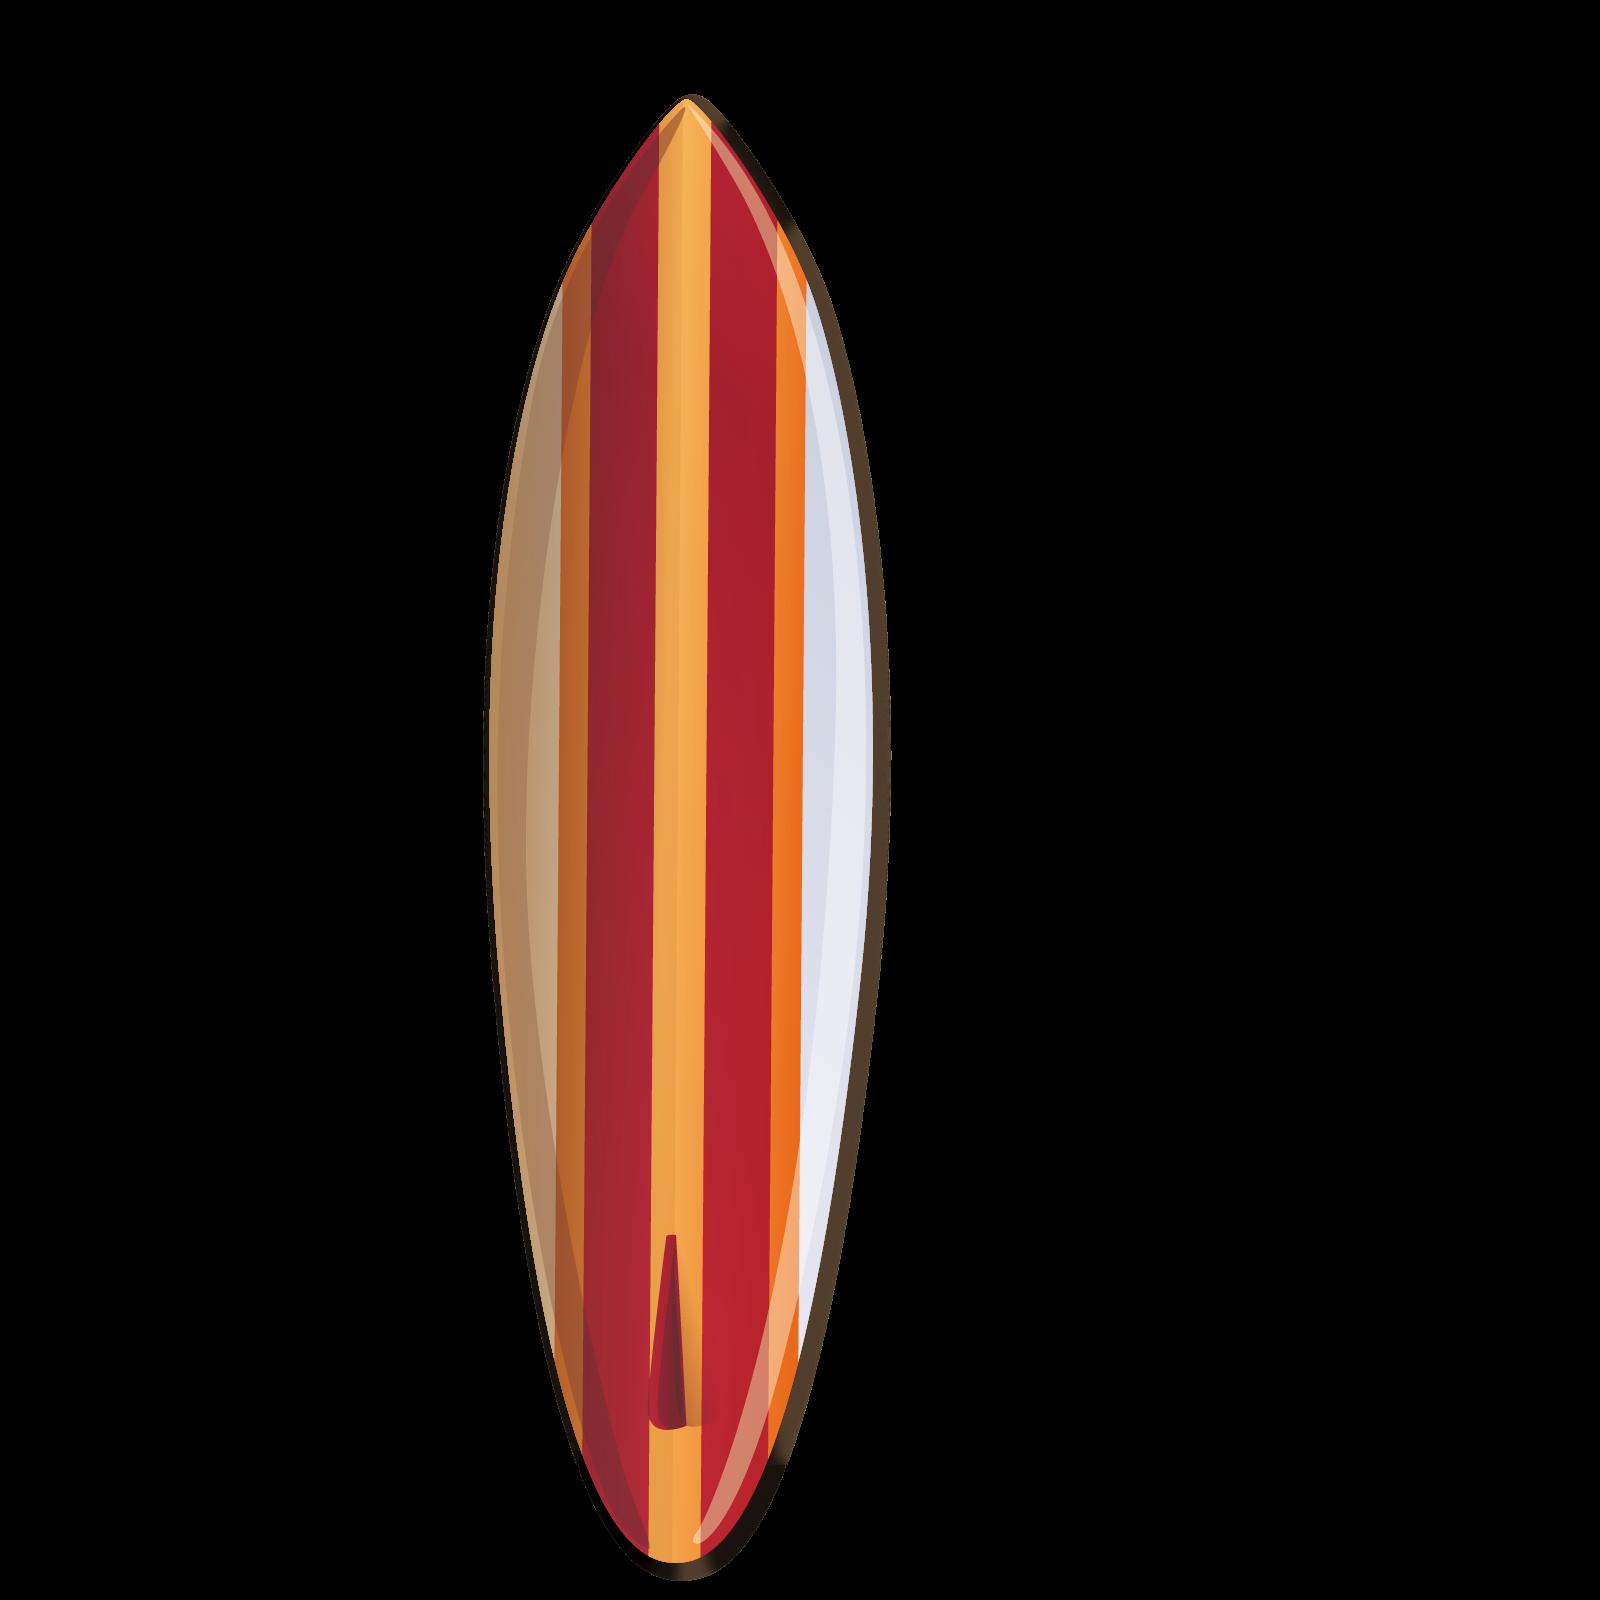 1600x1600 Skateboard Surfing Download